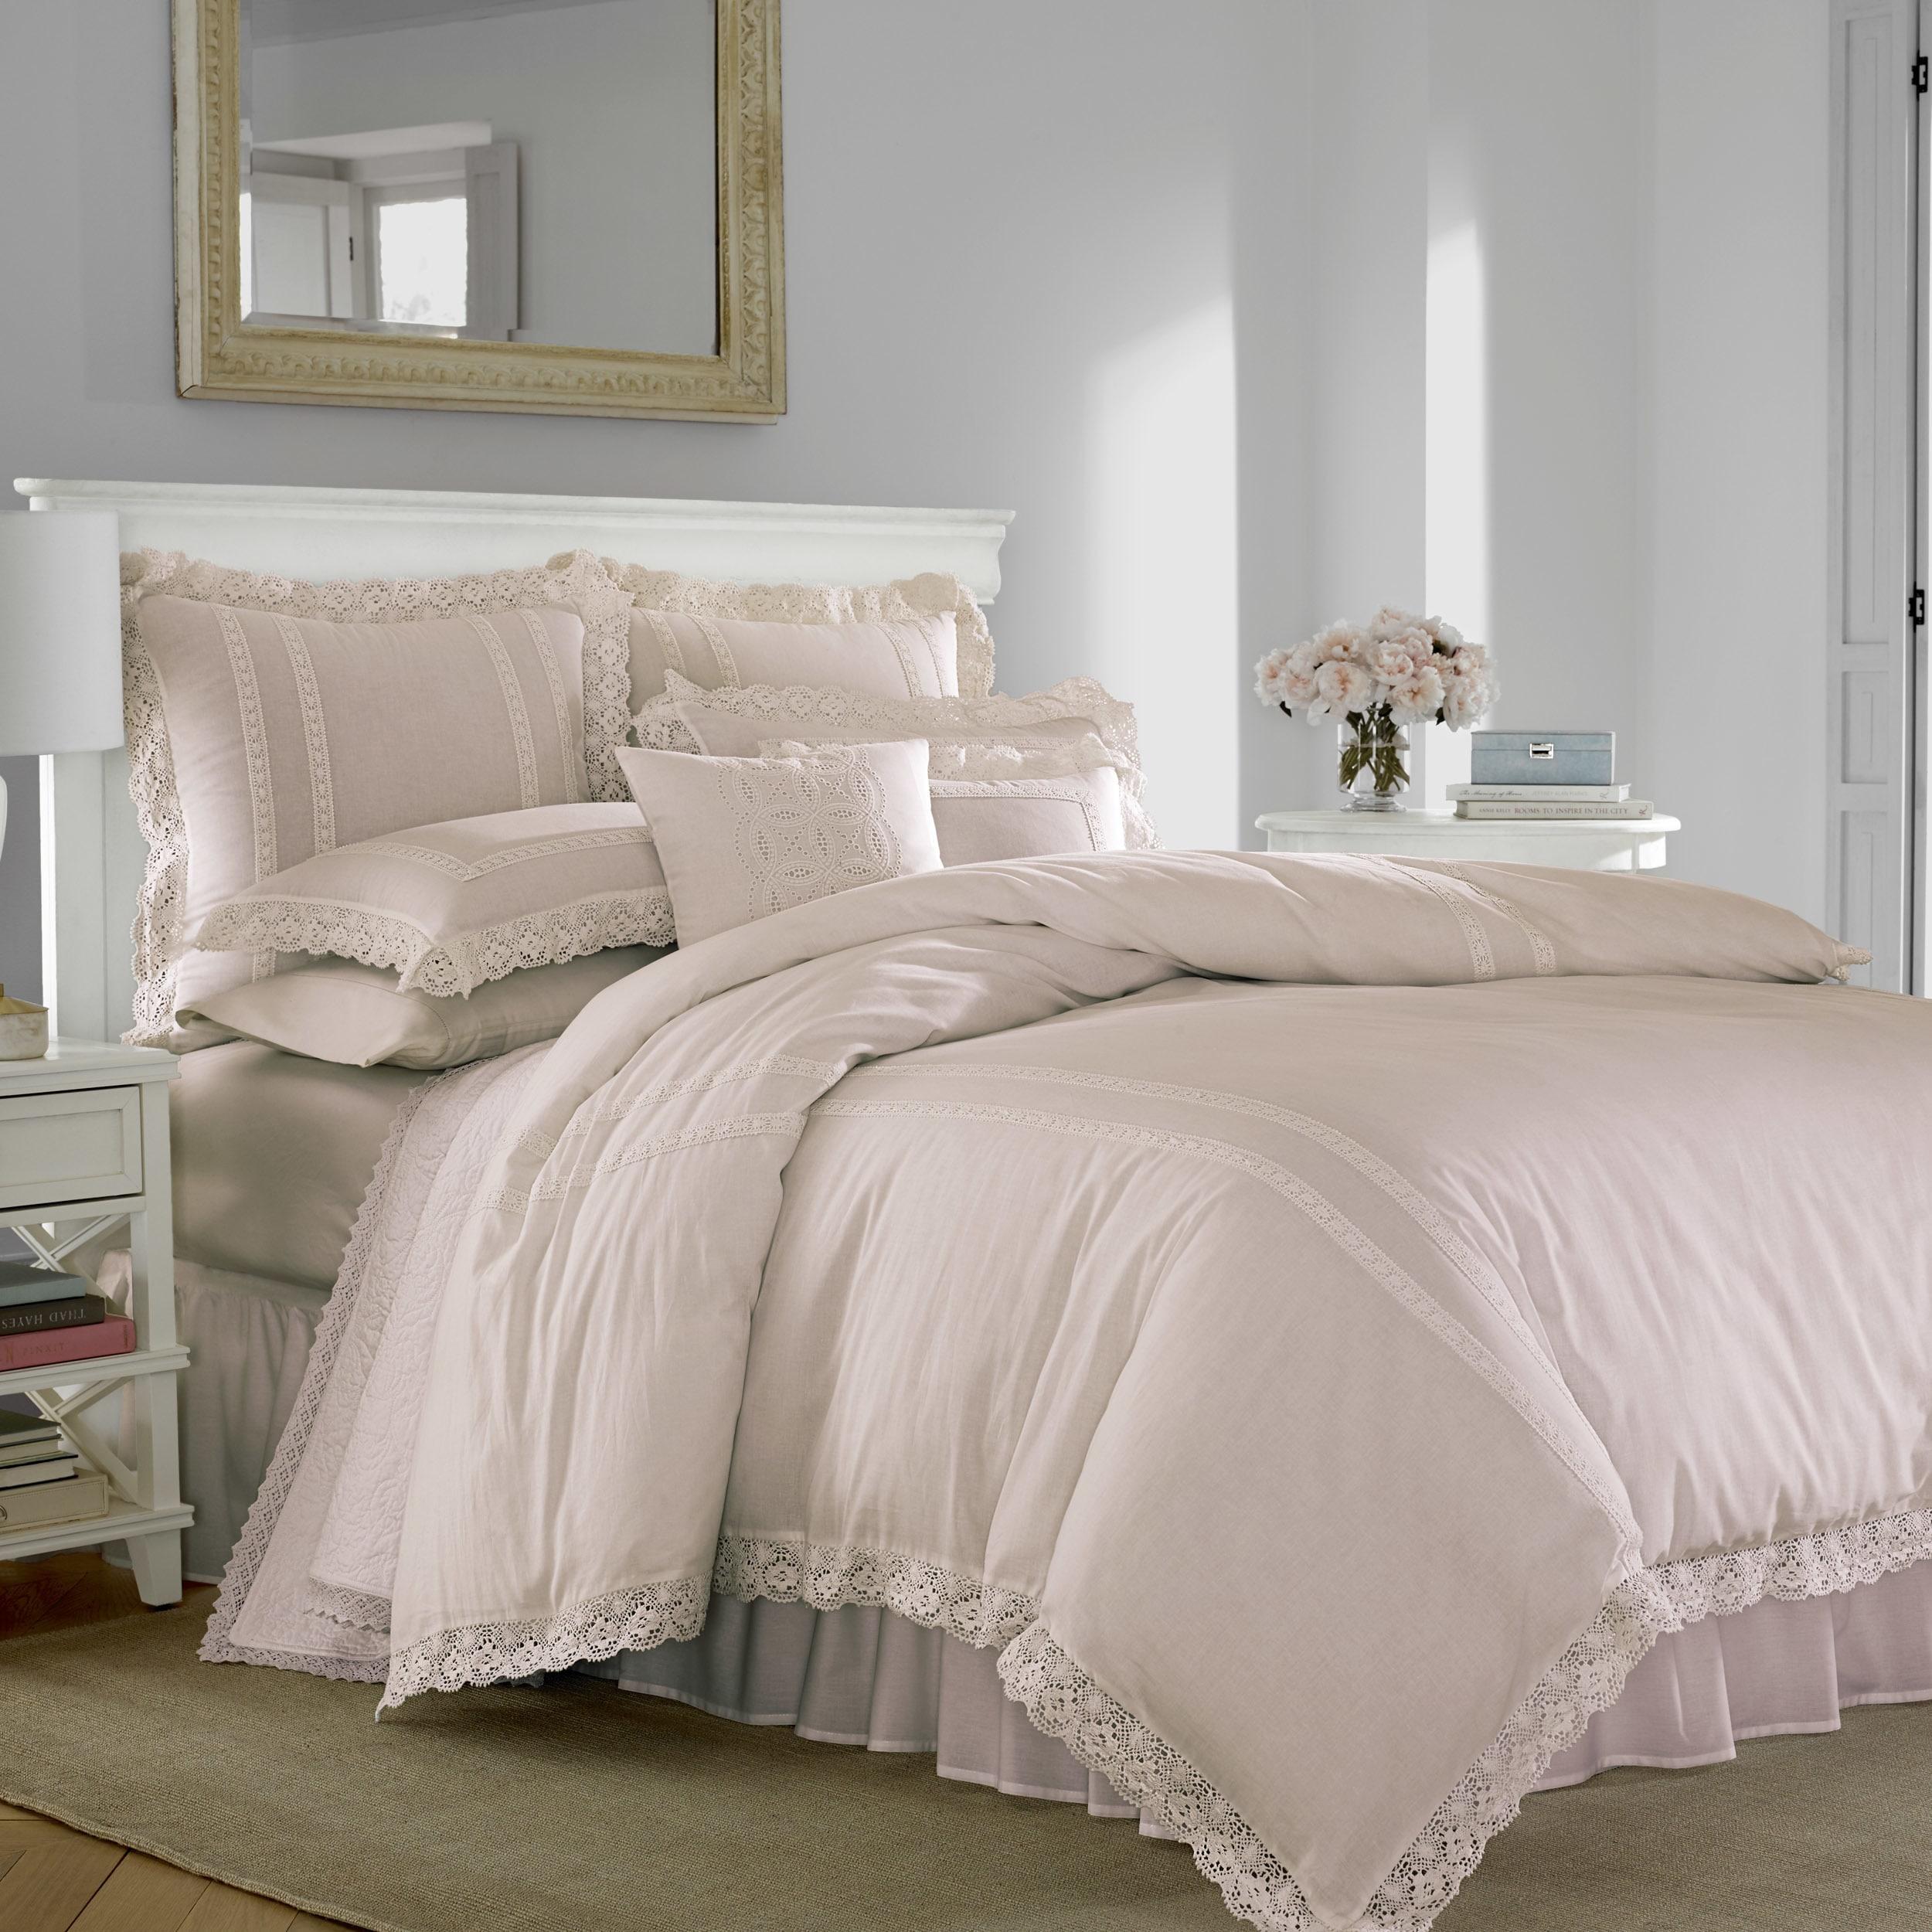 duvet laura ashley bedding harewoodpinkgrbl print uk resp invt harewood grapefruit all view large cover pink